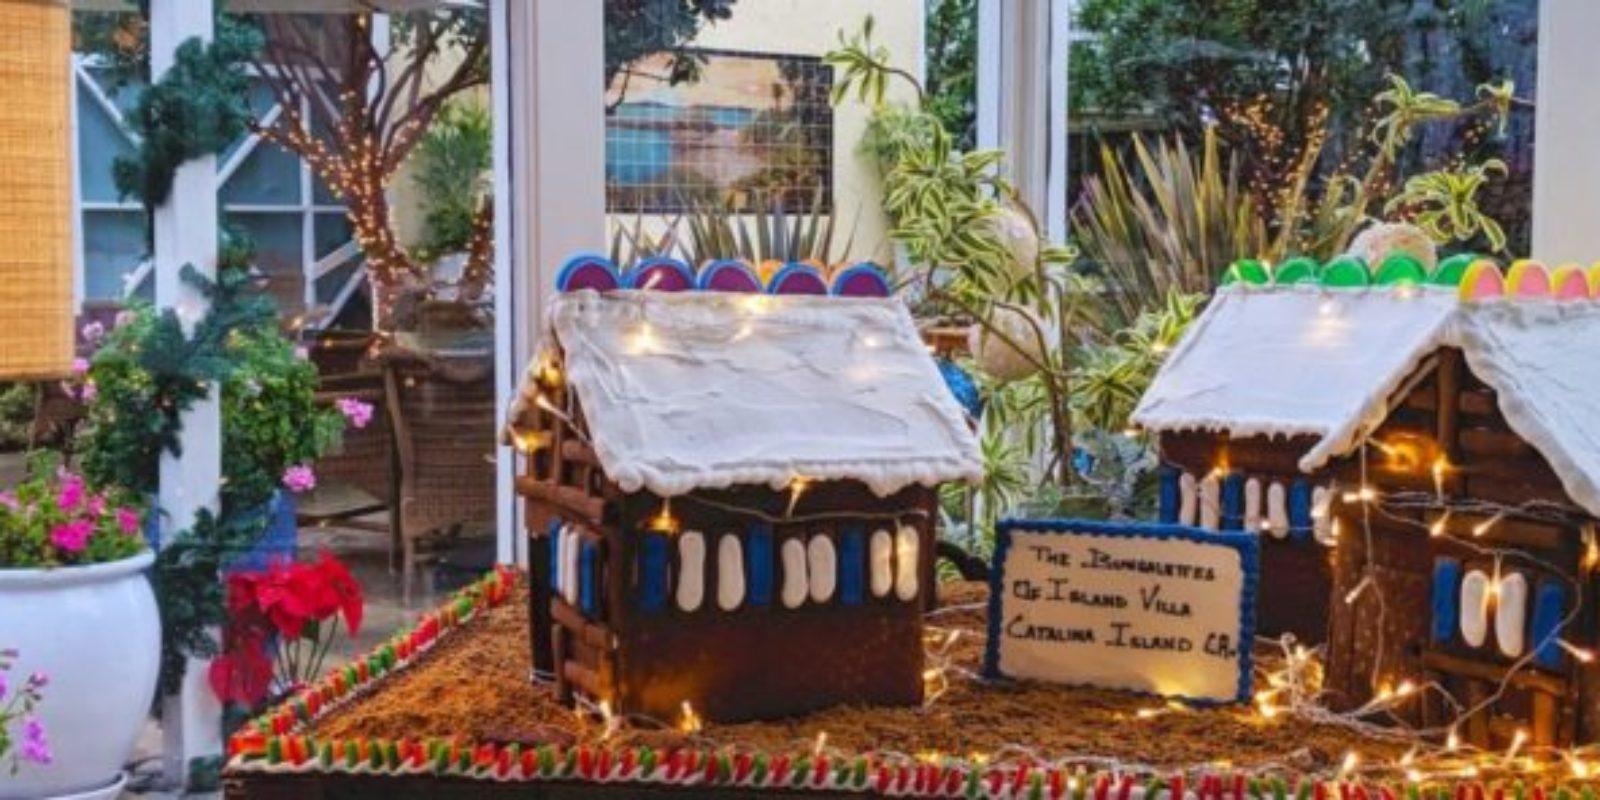 Catalina Island's Jovial Gingerbread Confections